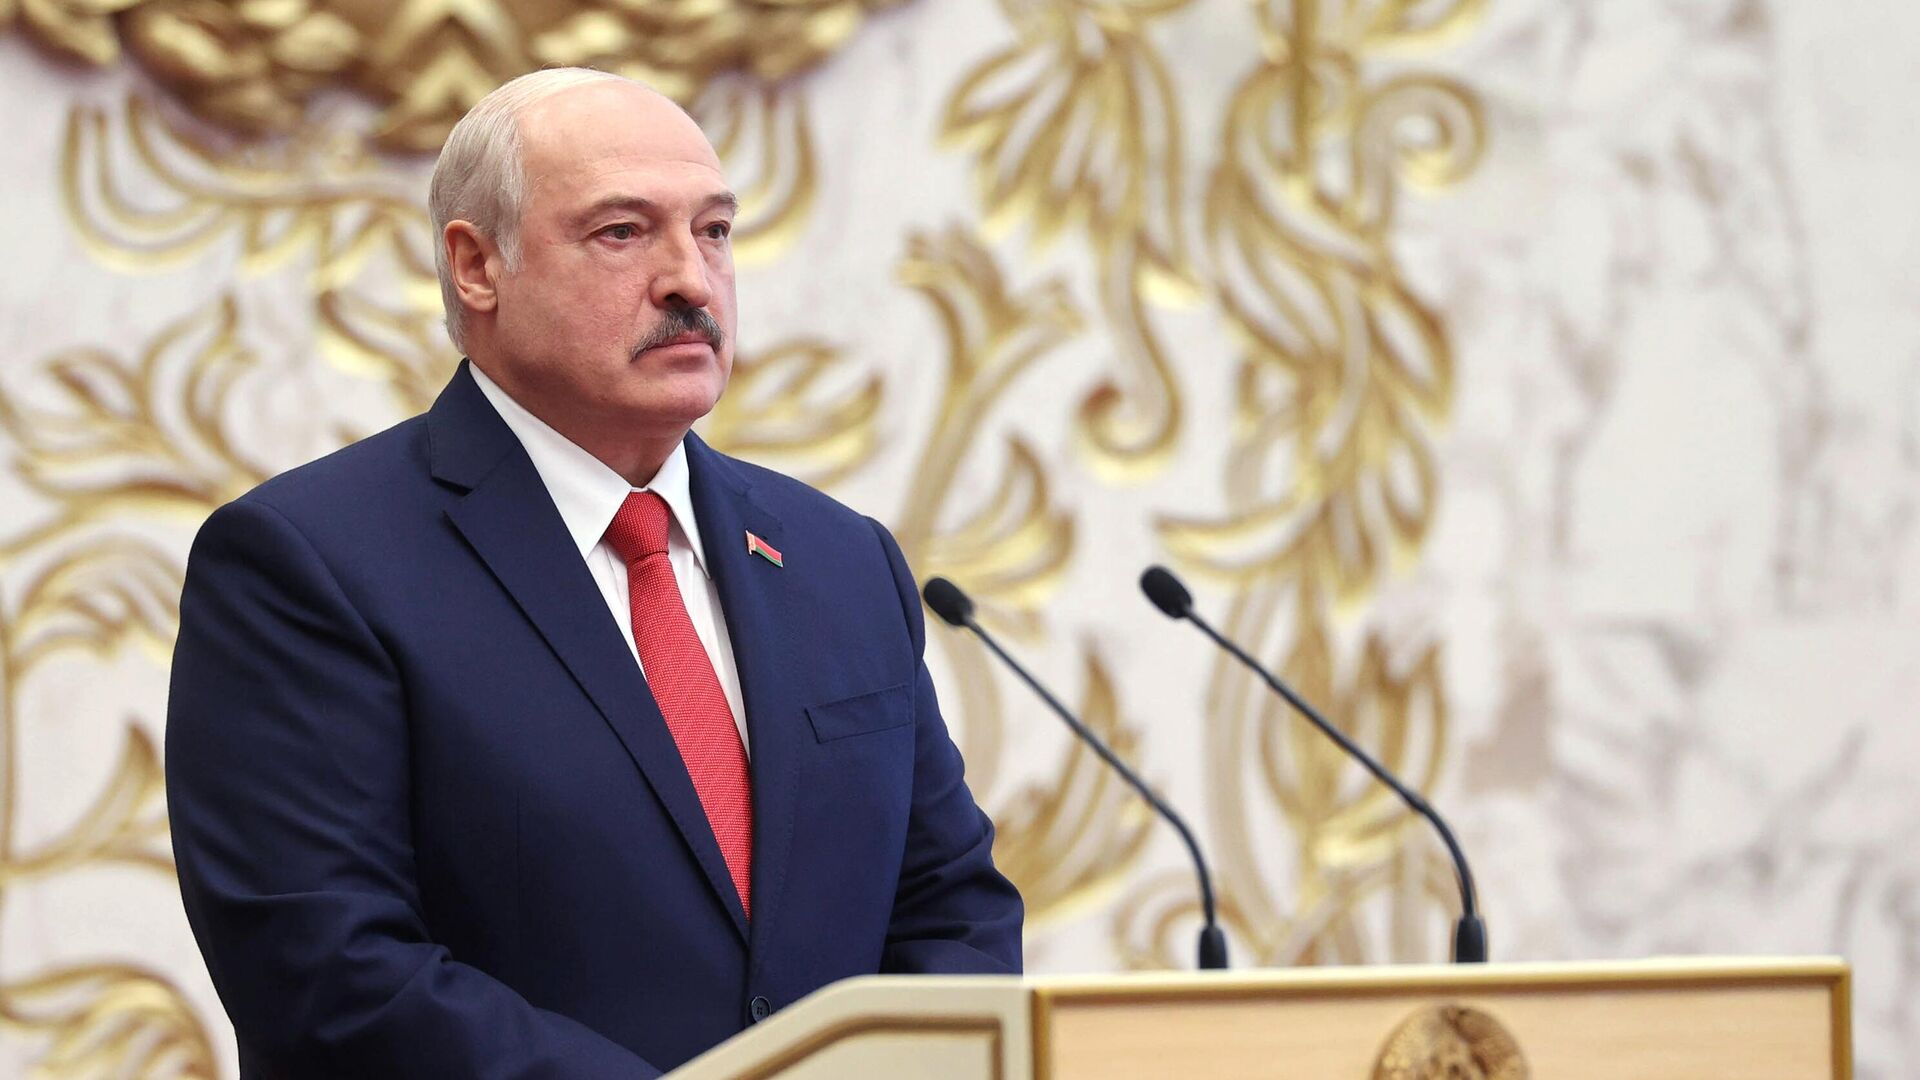 Президент Белоруссии Александр Лукашенко на церемонии инаугурации в Минске - РИА Новости, 1920, 09.10.2020